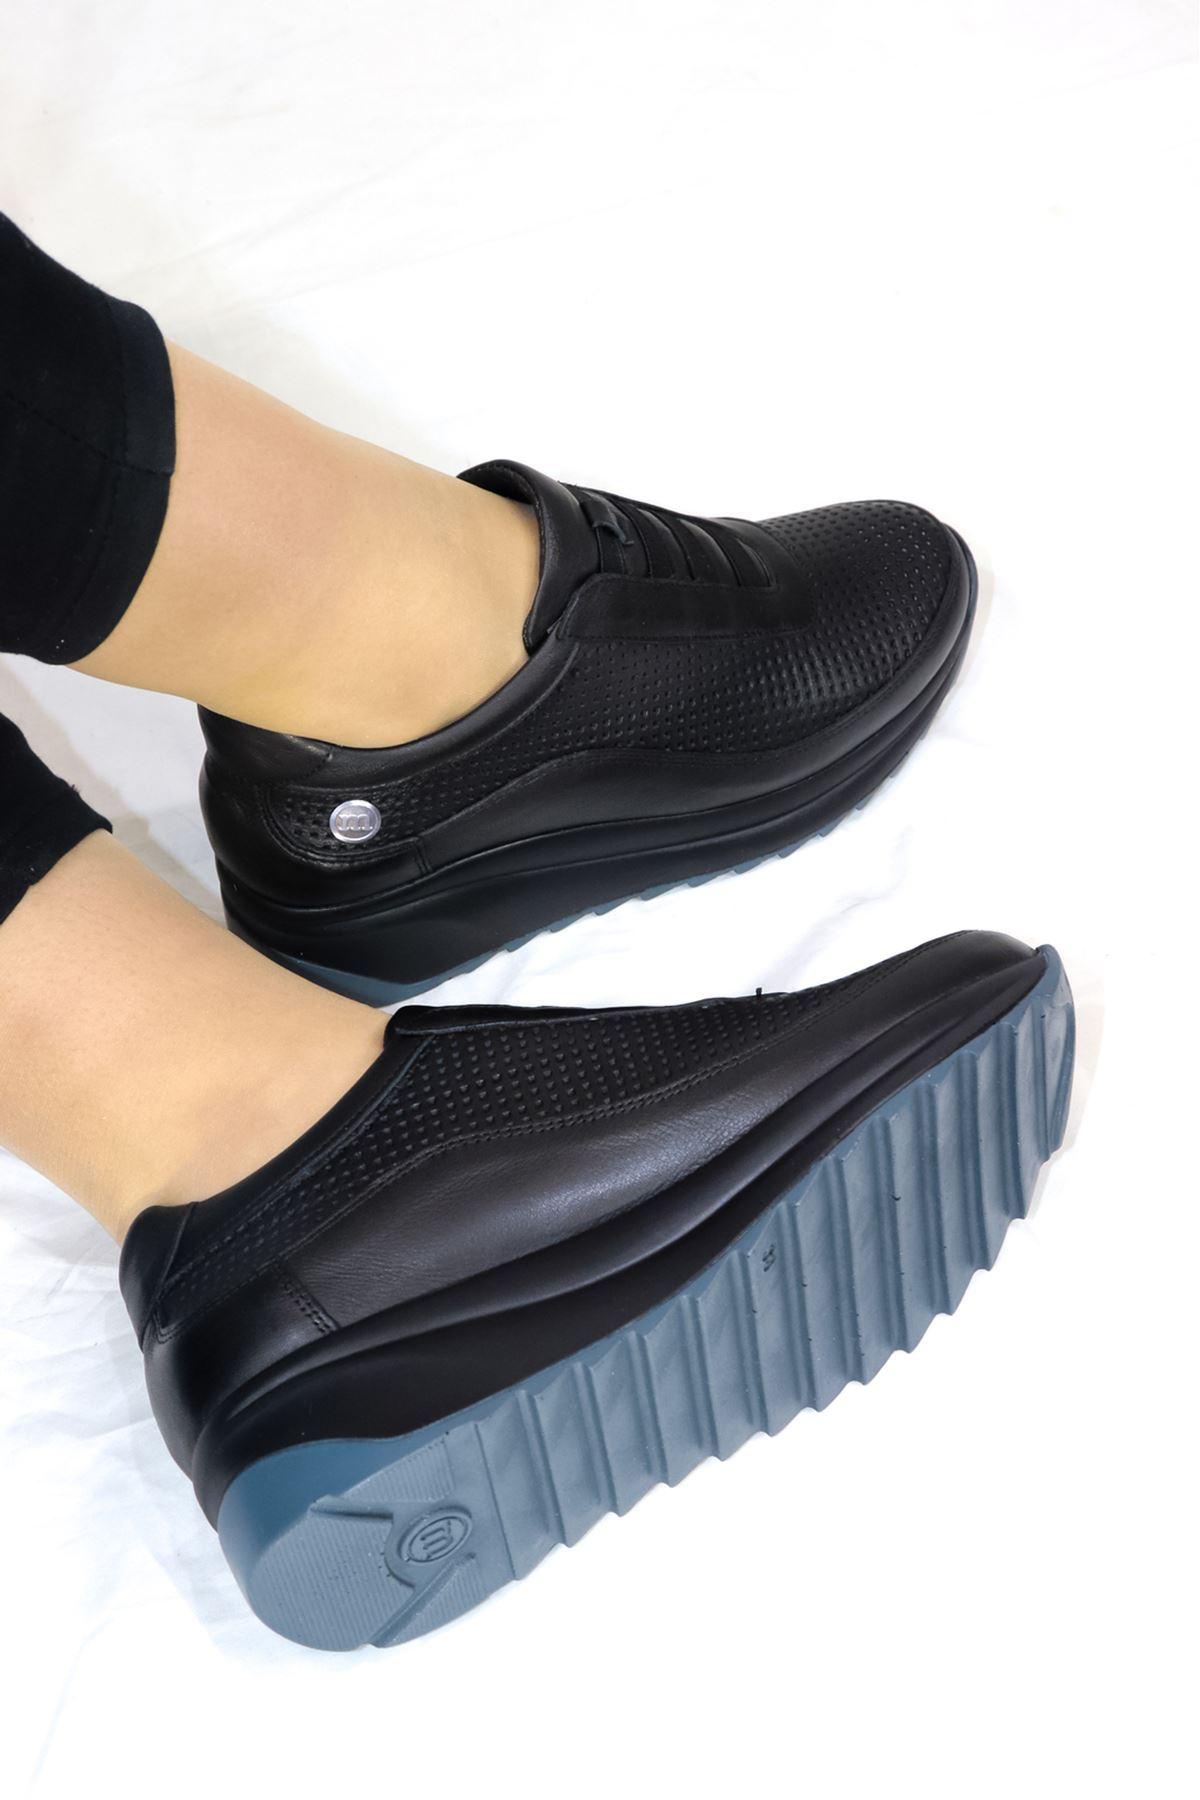 Mammamia - D21YA - 3220-B Siyah Lastikli Dolgu Topuk Kadın Ayakkabısı